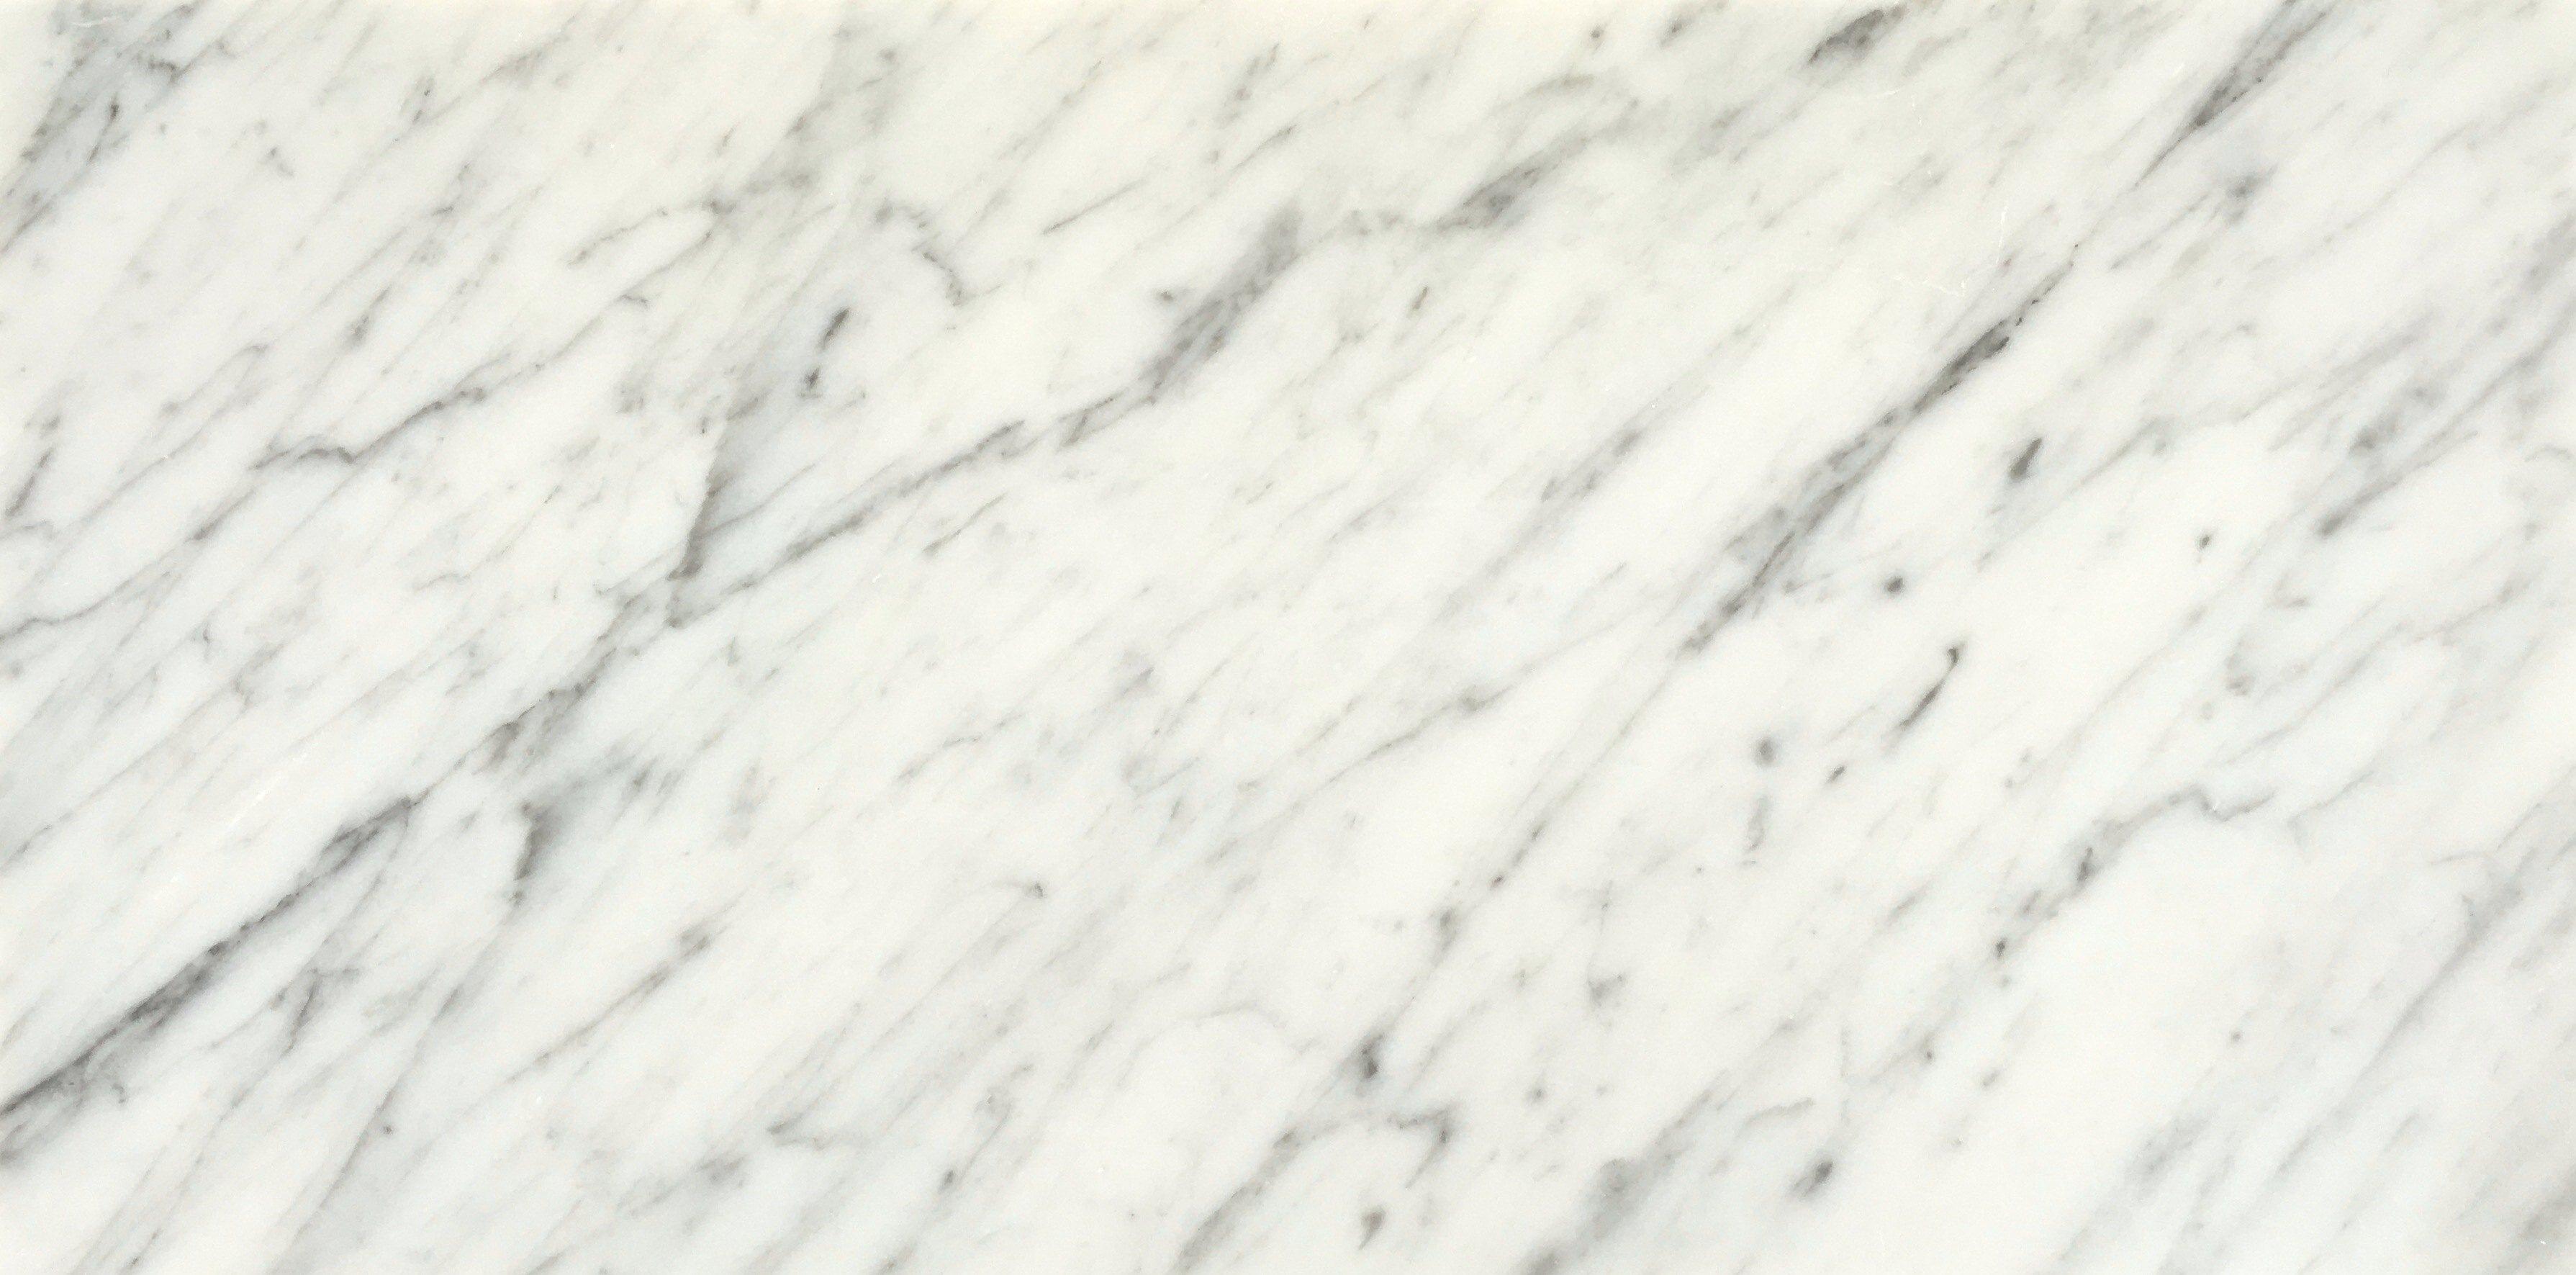 20 Bianco Carrara Venatino Salvini Marmi Marbles